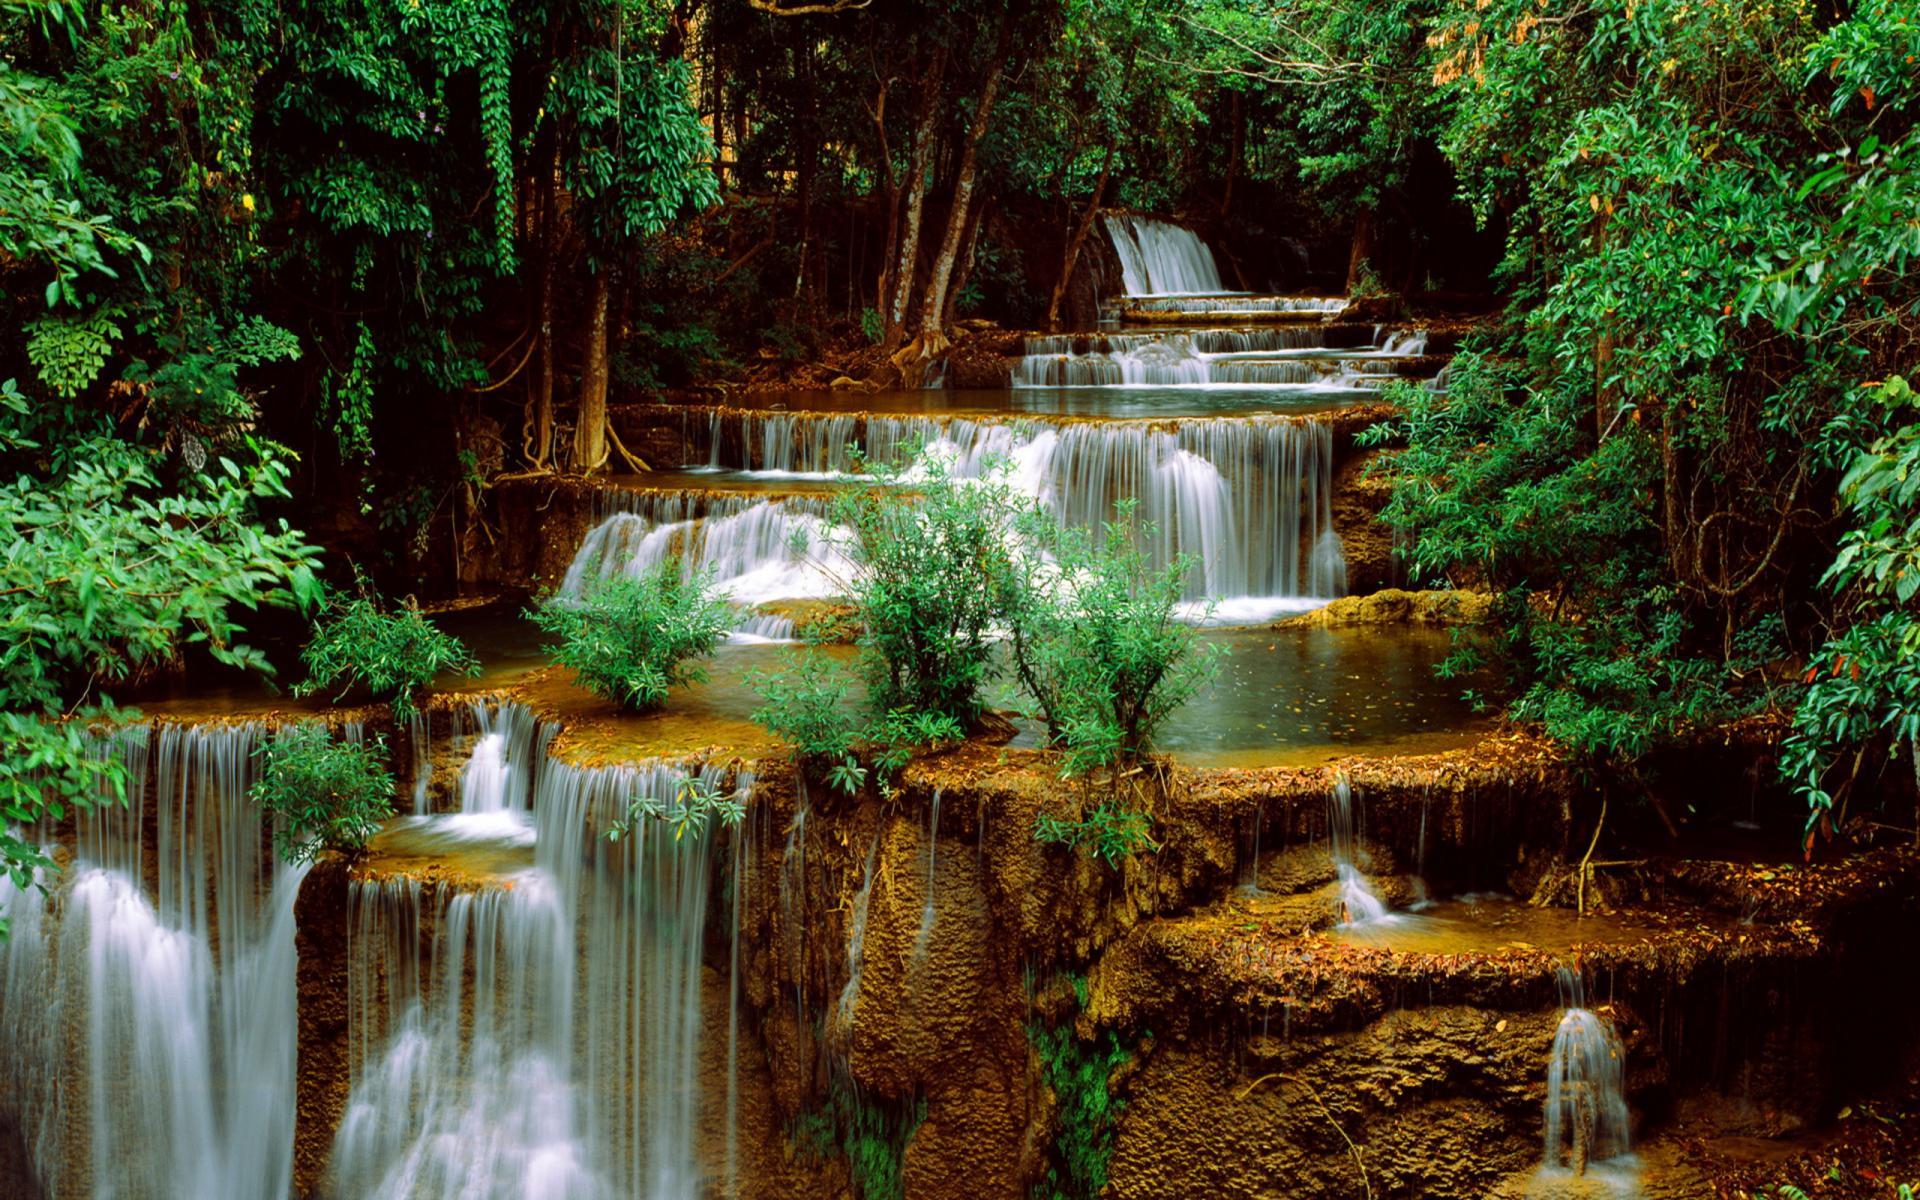 Great Falls Wallpapers Hd Widescreen 10 Beautiful Waterfall Wallpapers Beautiful Wallpapers